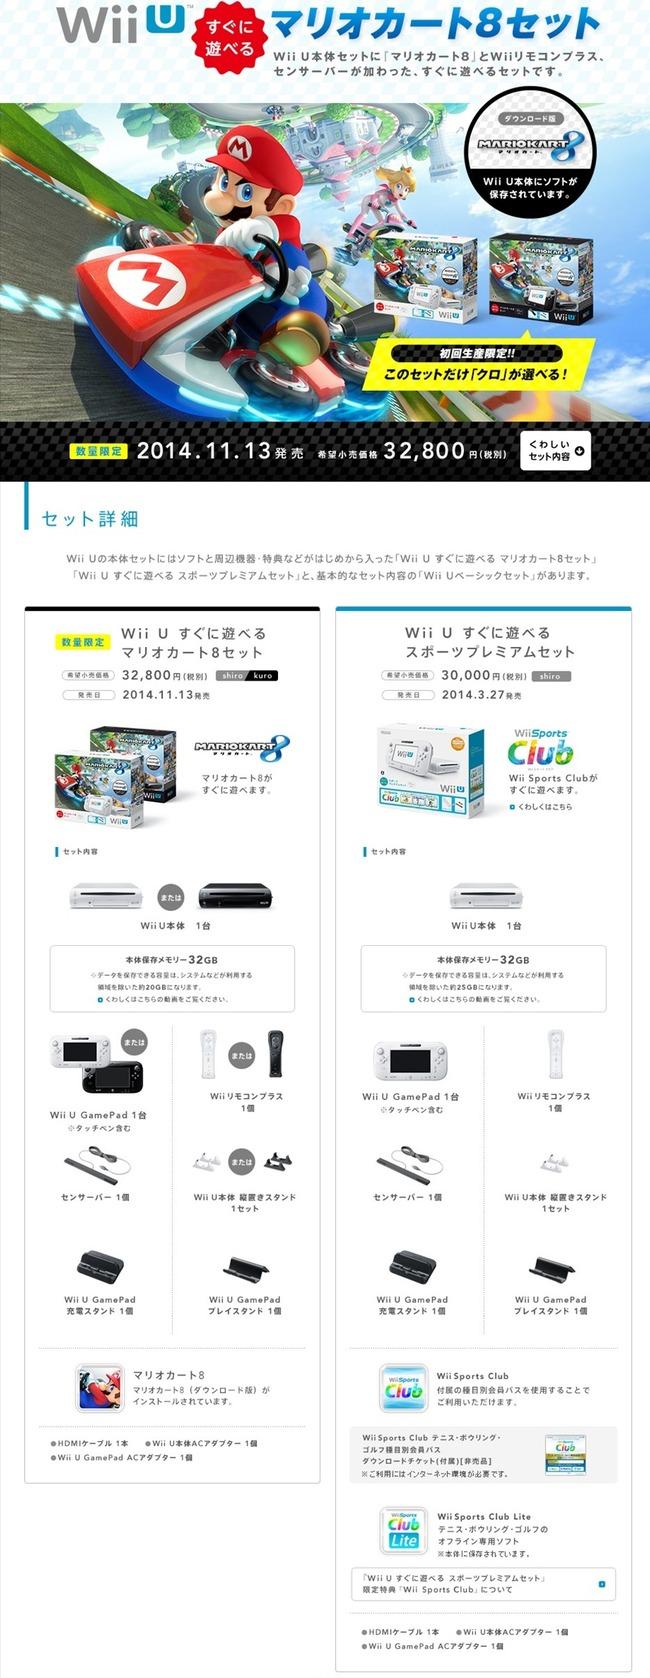 WiiU マリオカート8に関連した画像-03